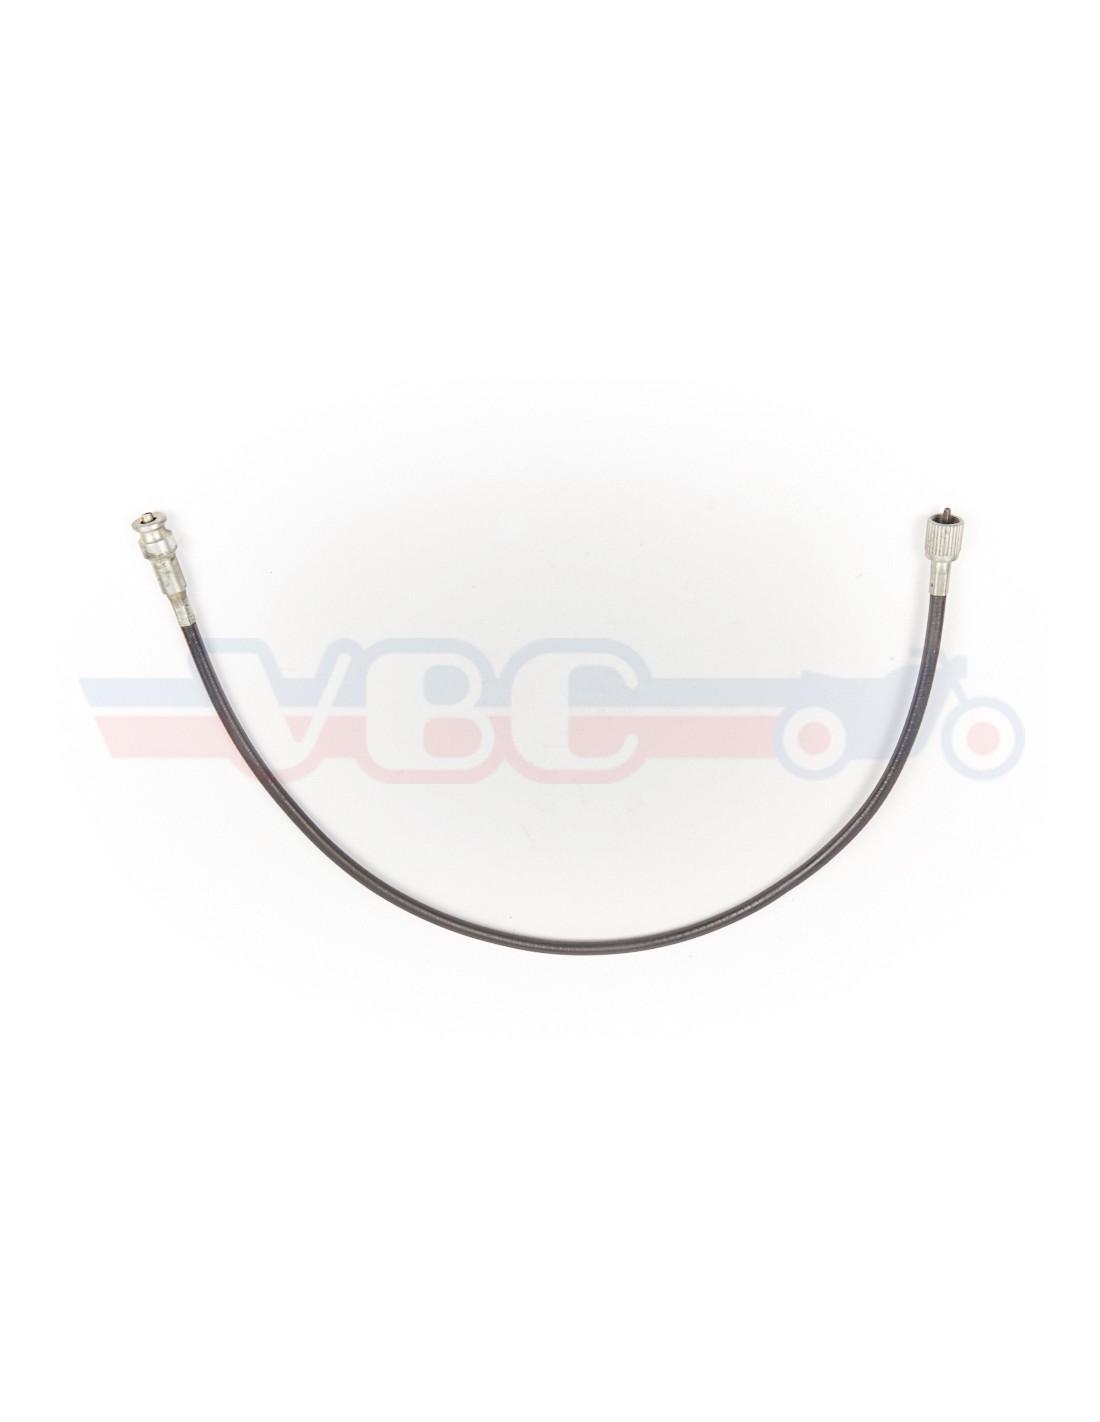 Cable de compte tours CB350 / 400 Four HONDA 37260-333-000